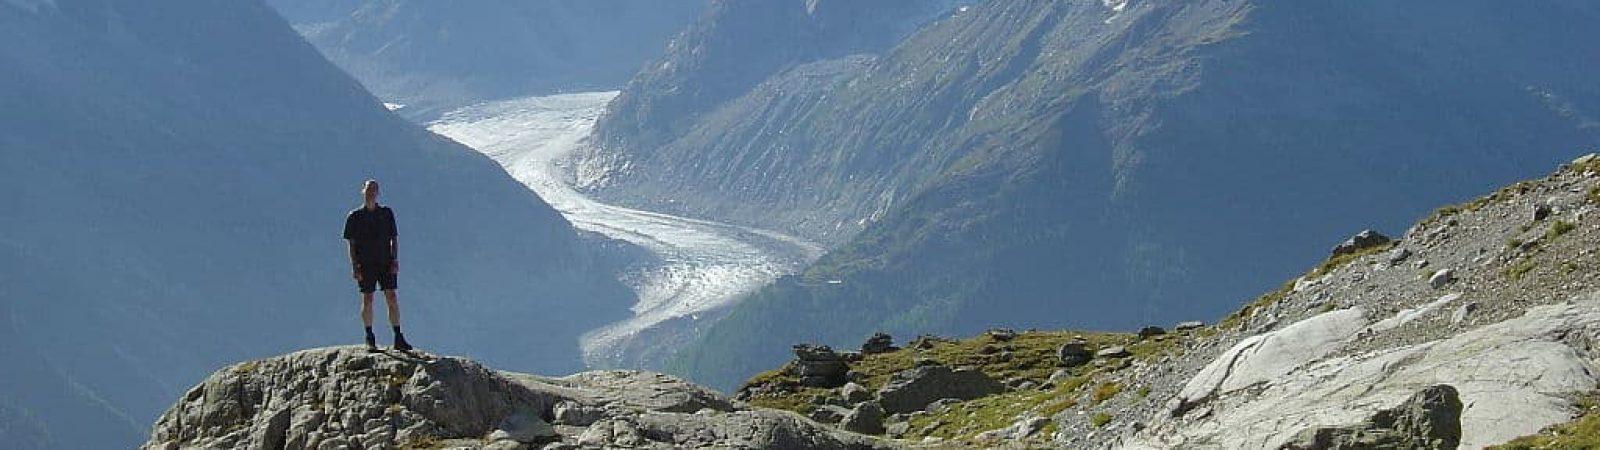 8-day Tour du Mont Blanc traversing 3 countries